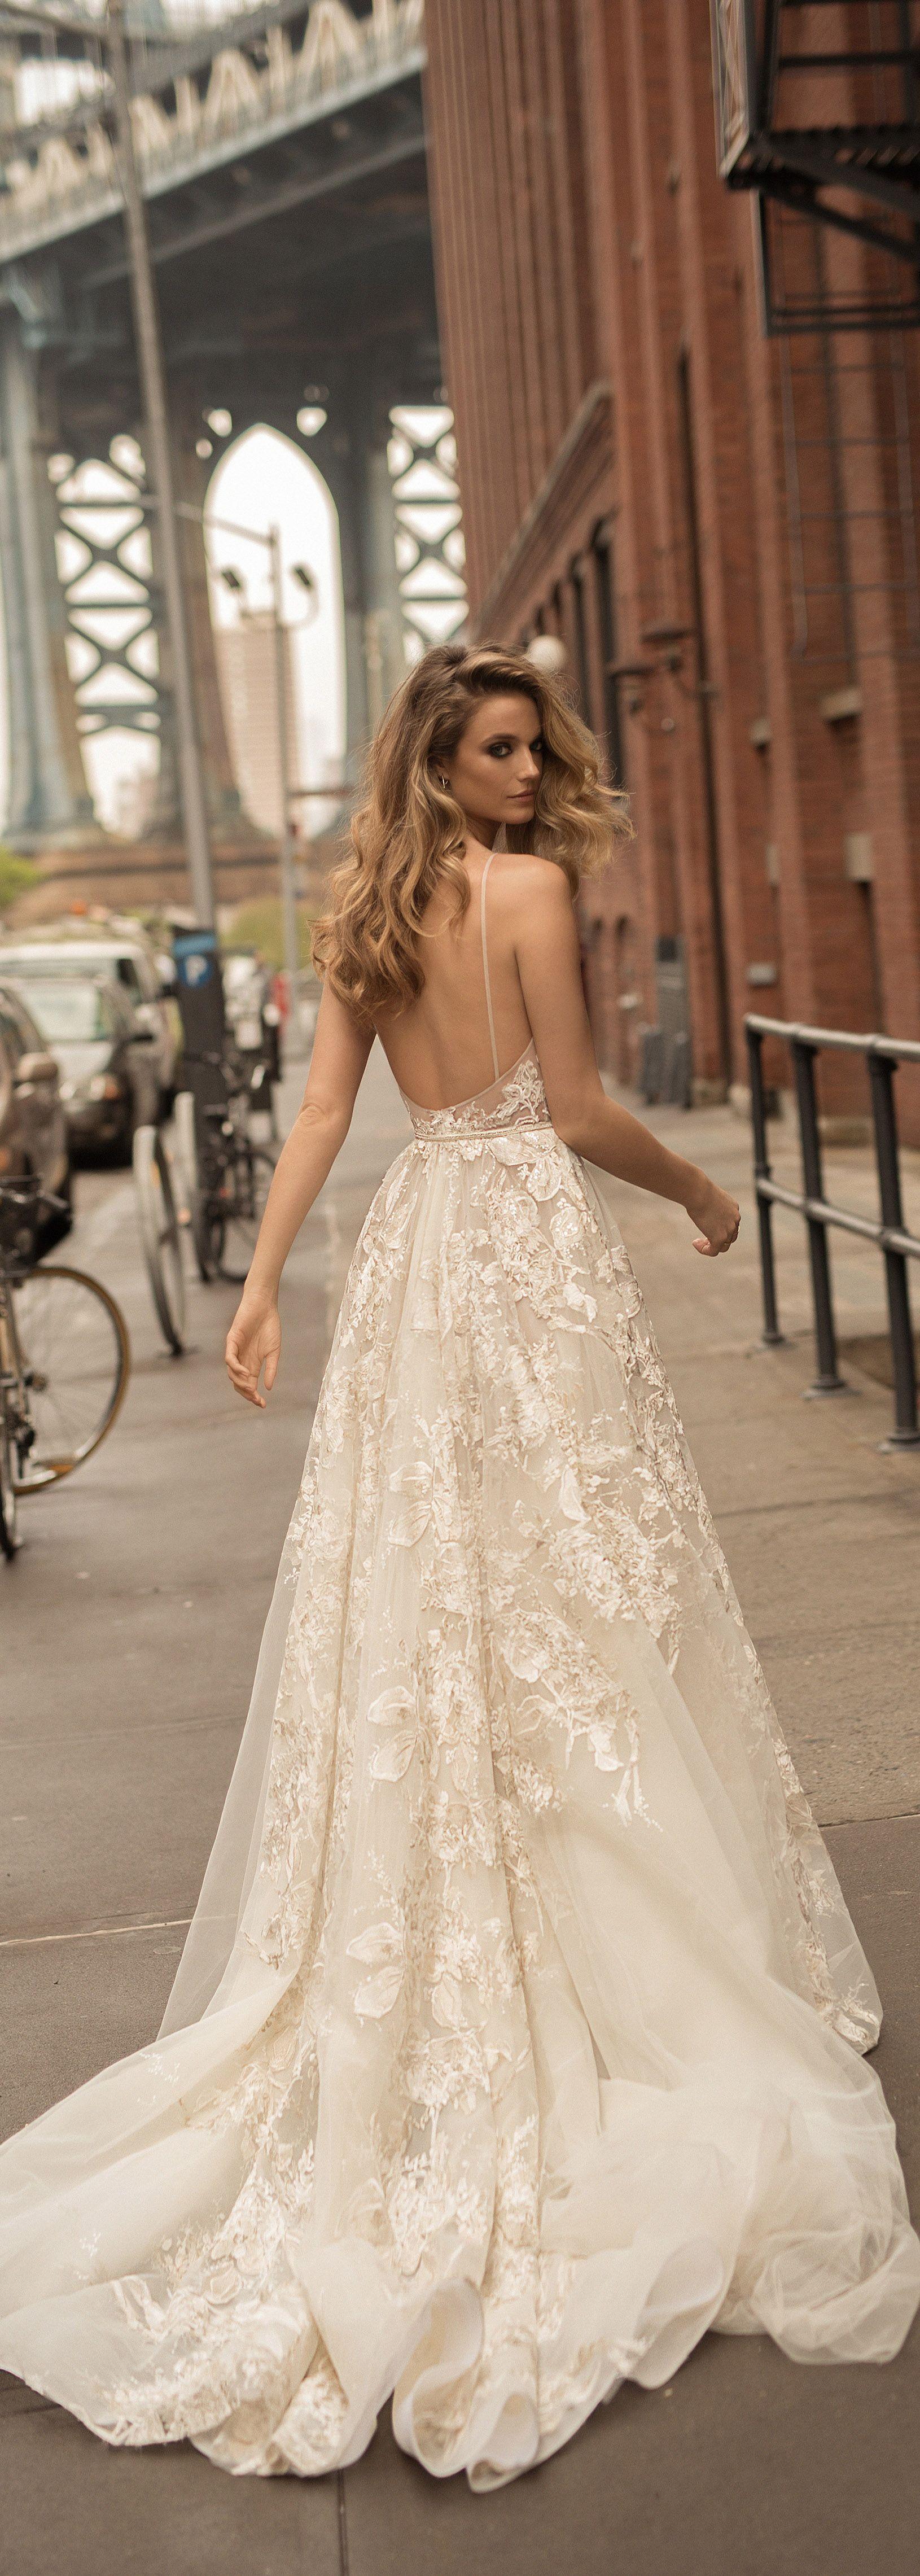 berta 2018 bridal collection style 18 12 3 berta 2018